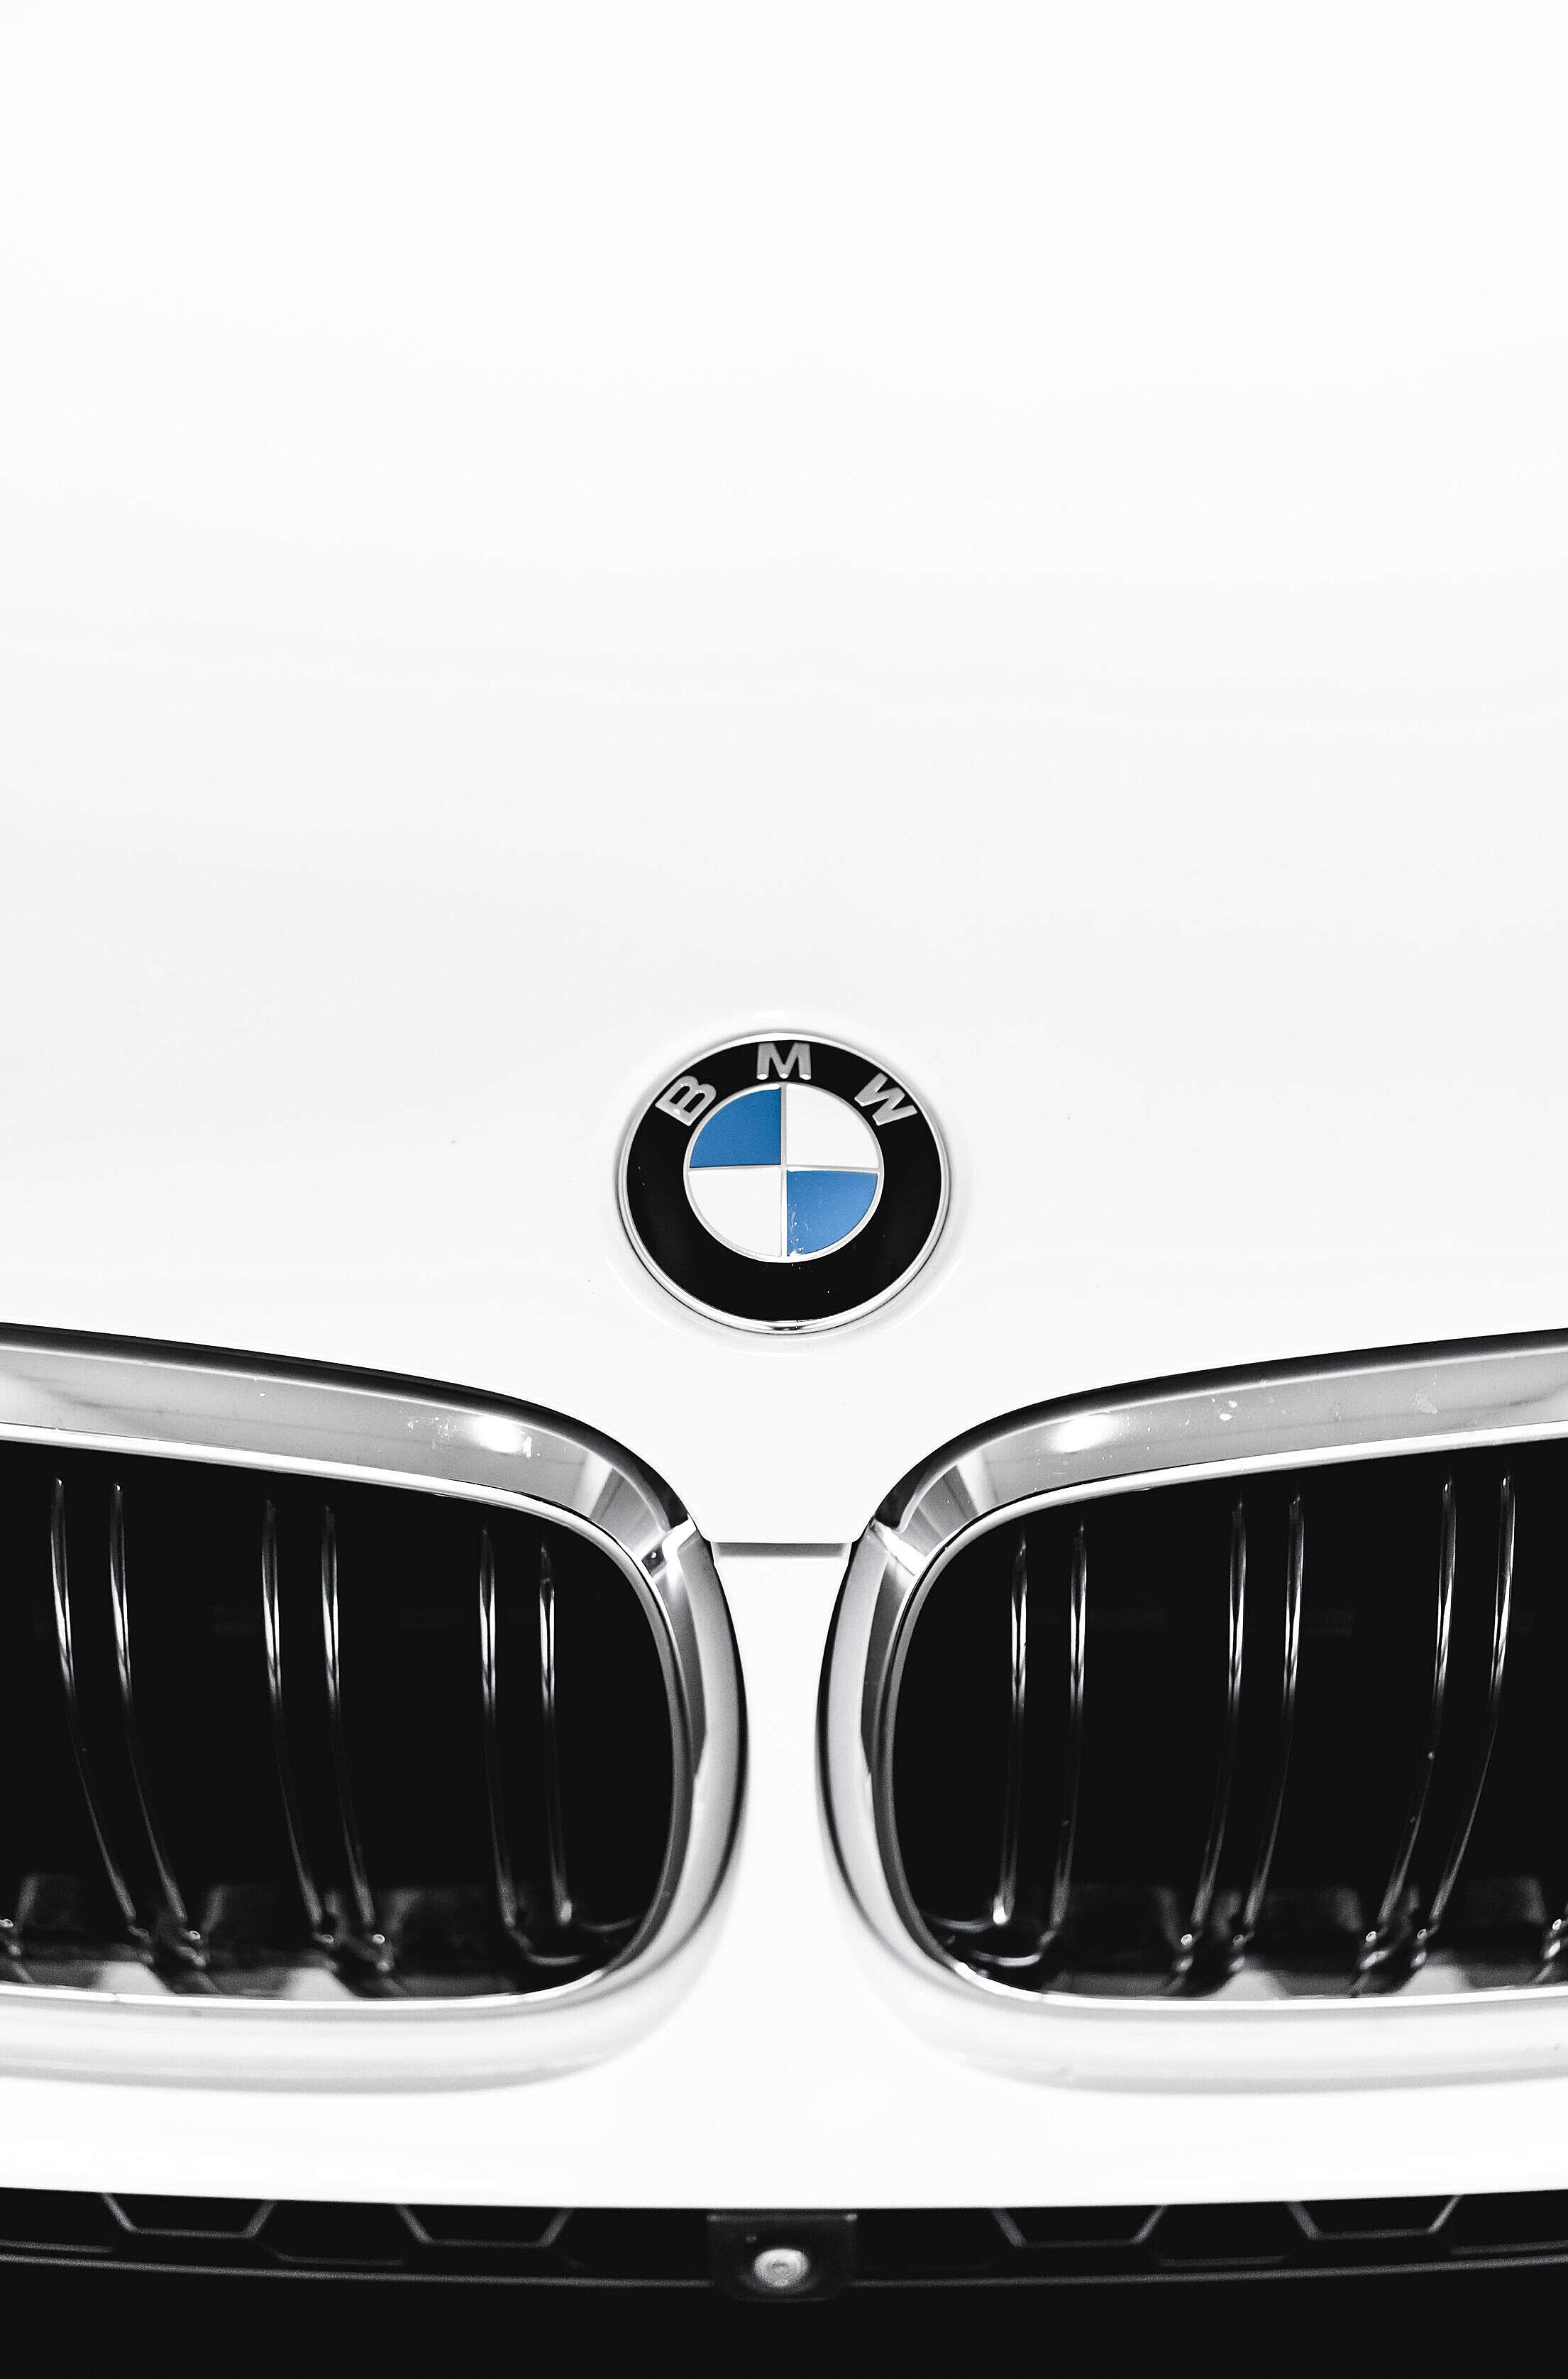 BMW Car Bonnet Badge Free Stock Photo